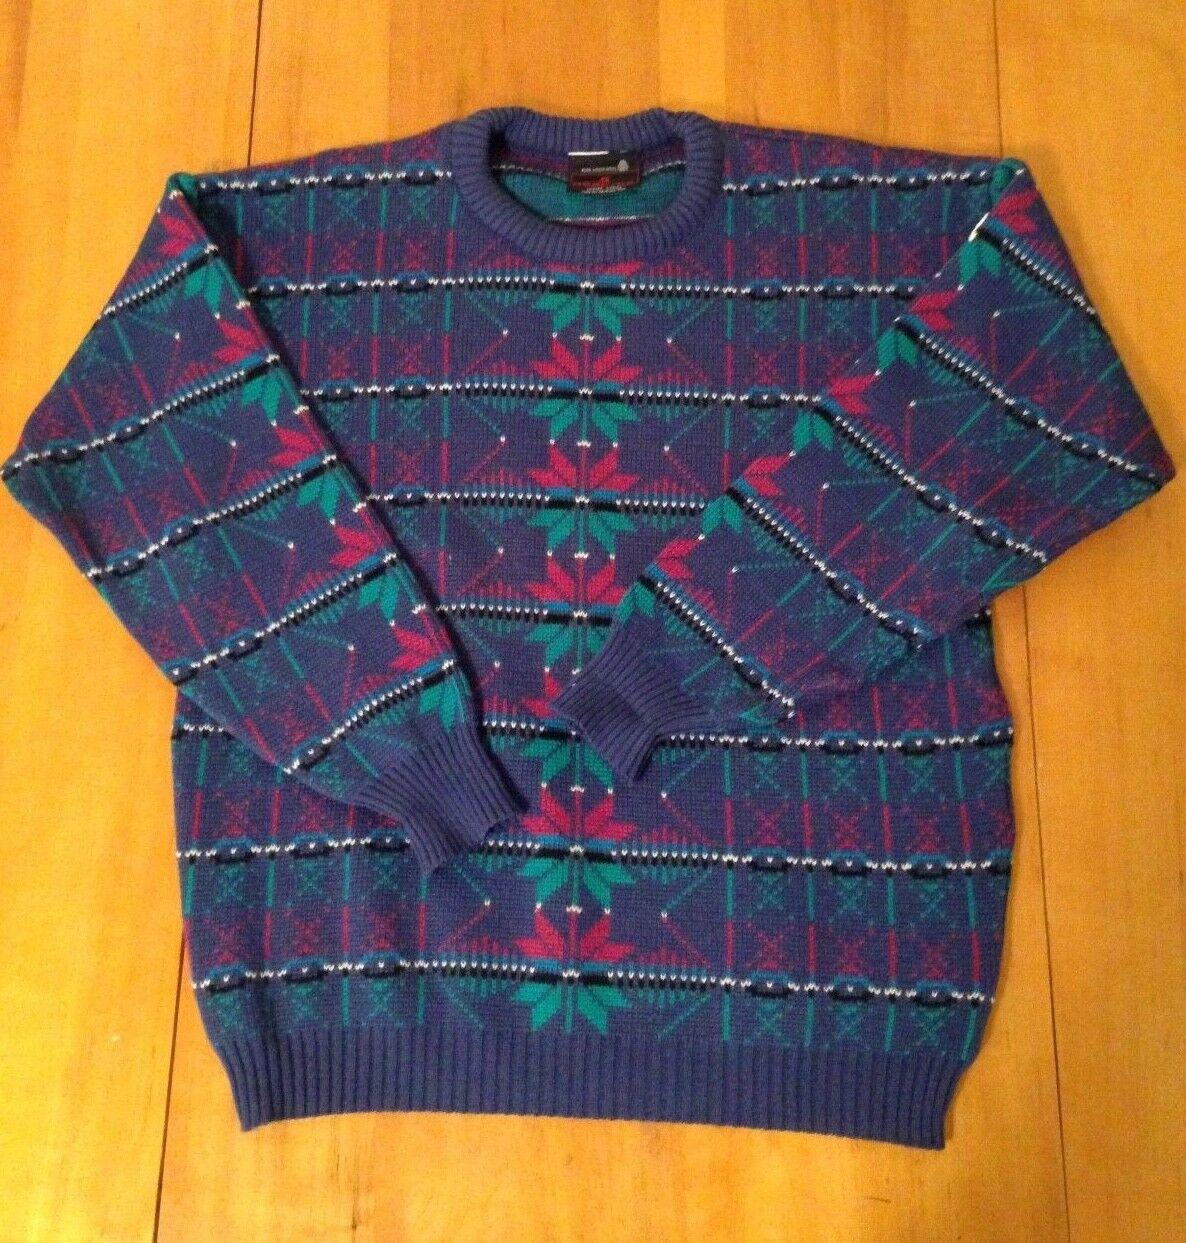 VTG 80s 90s DEMETRE Geometric Ski Sweater 100% Pure Virgin Wool Women's Size L